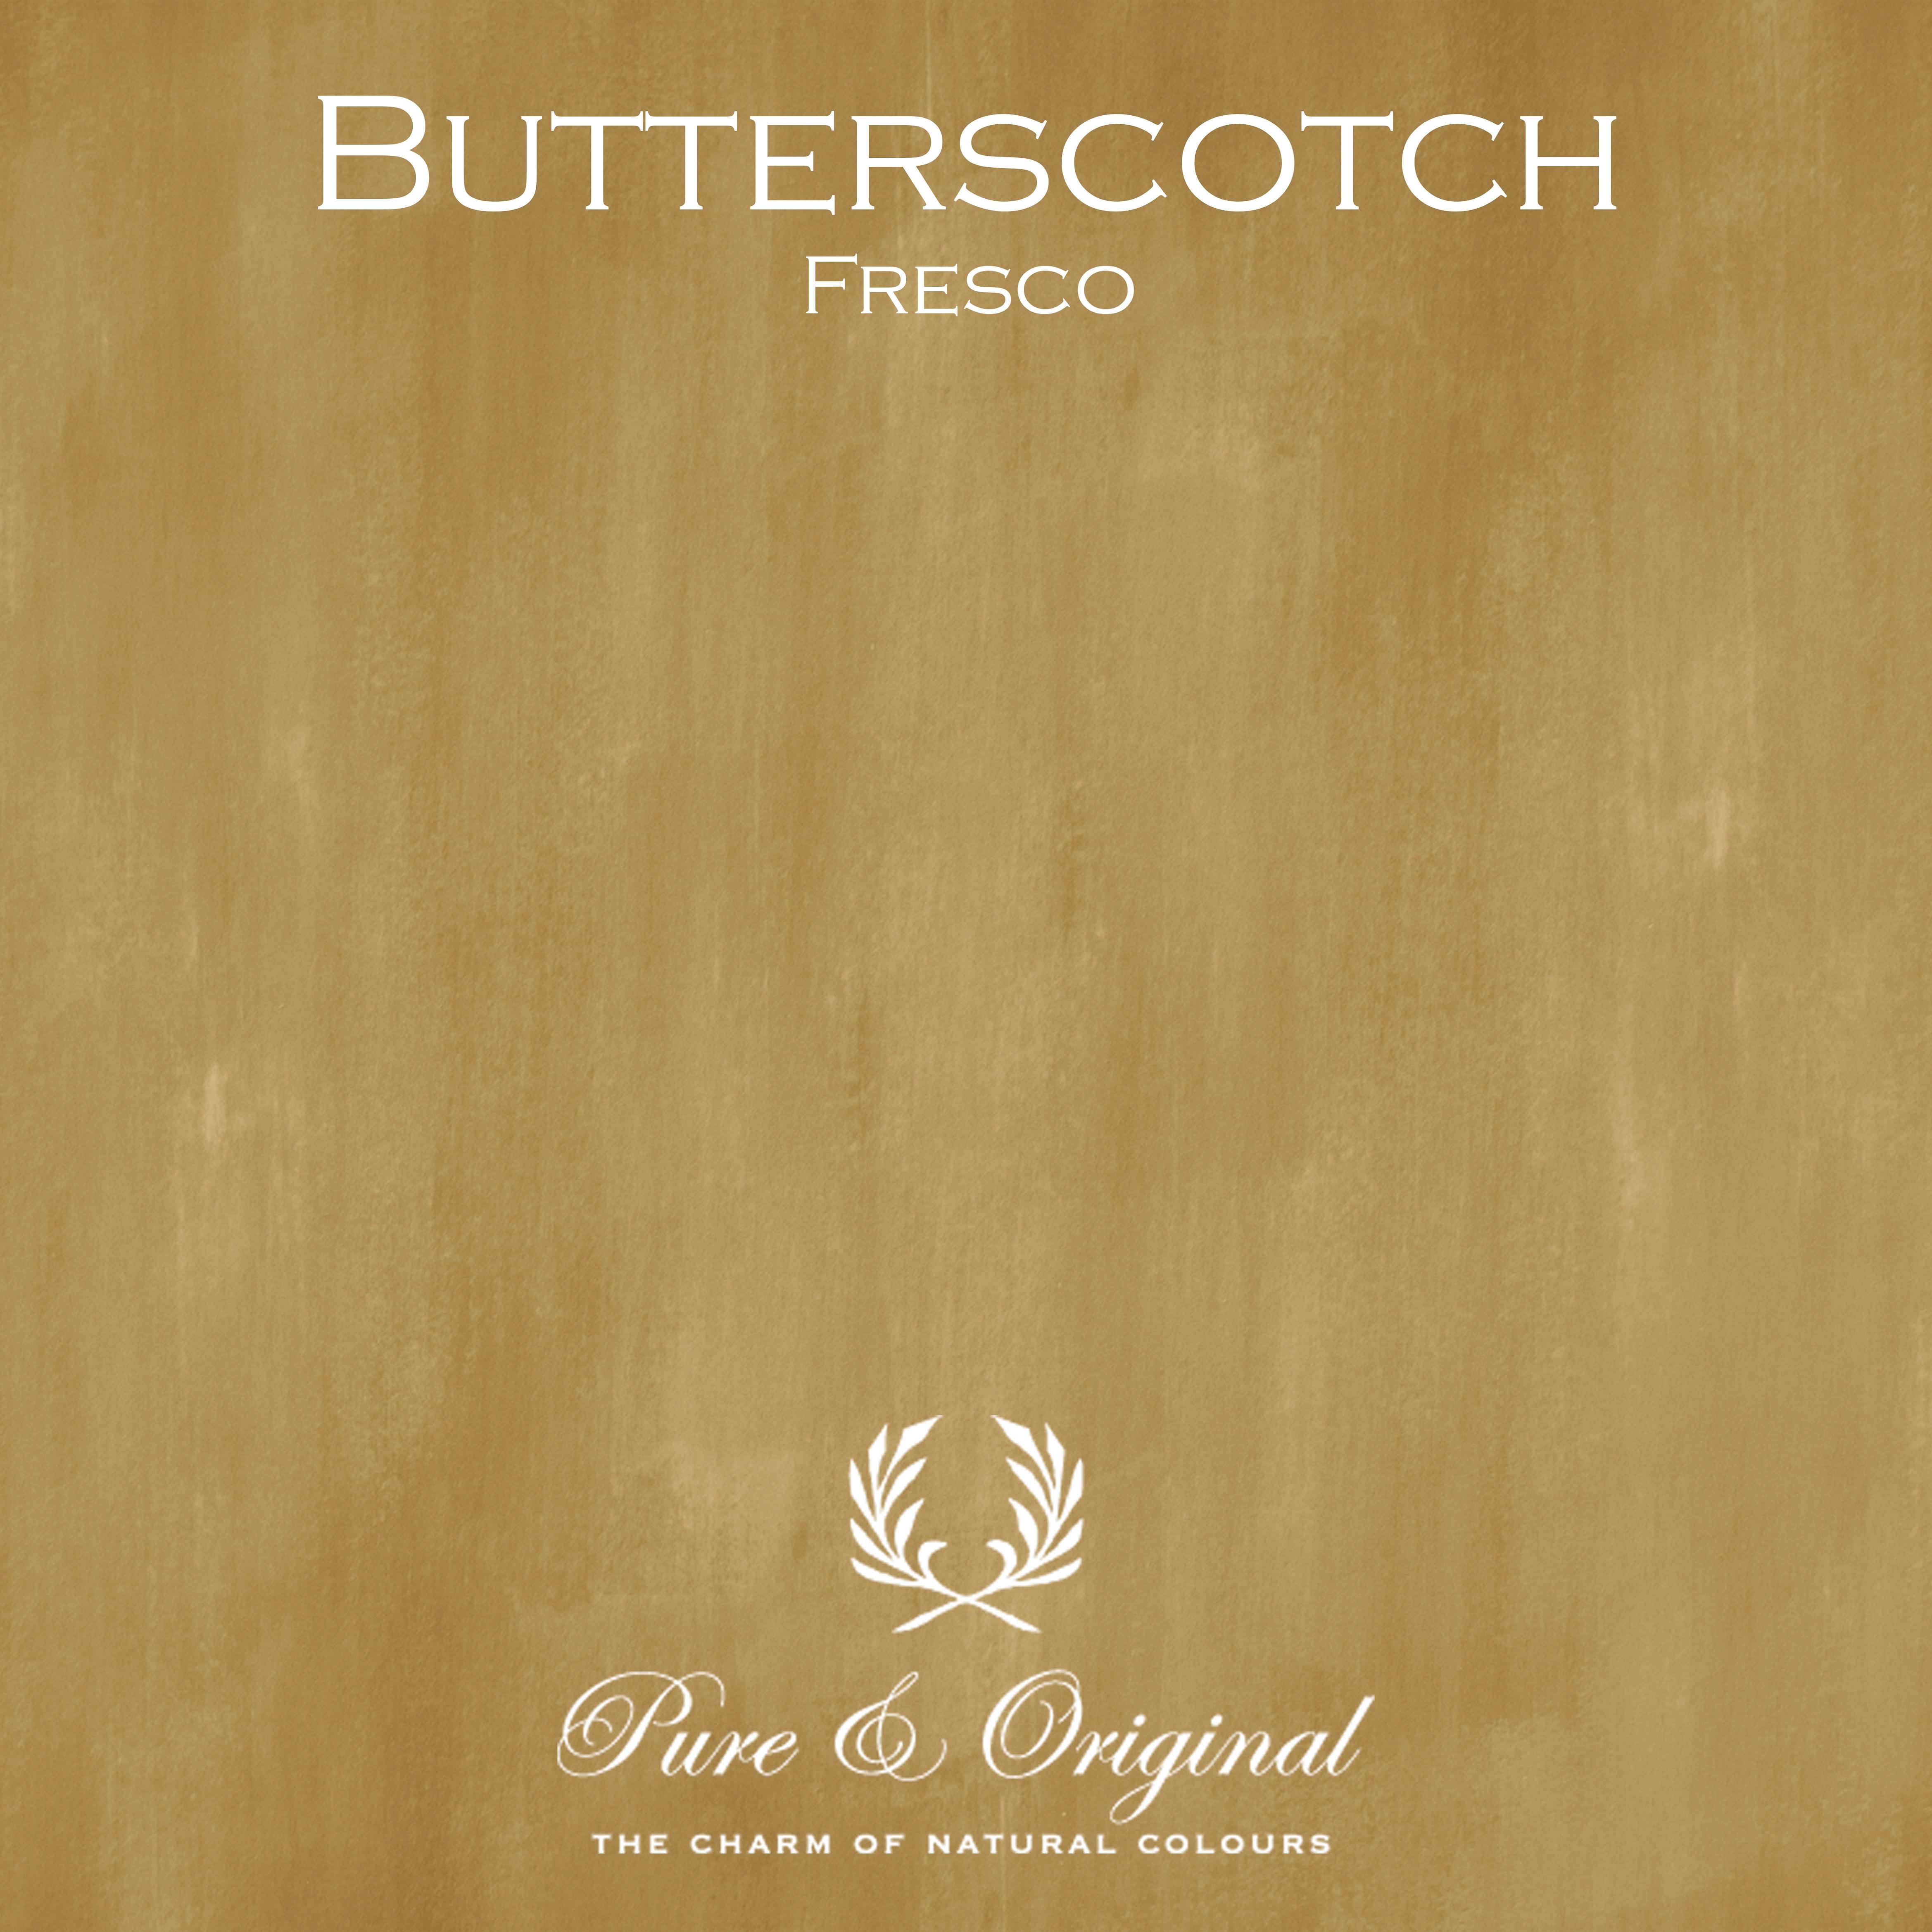 Kulör Butterscotch, Fresco kalkfärg